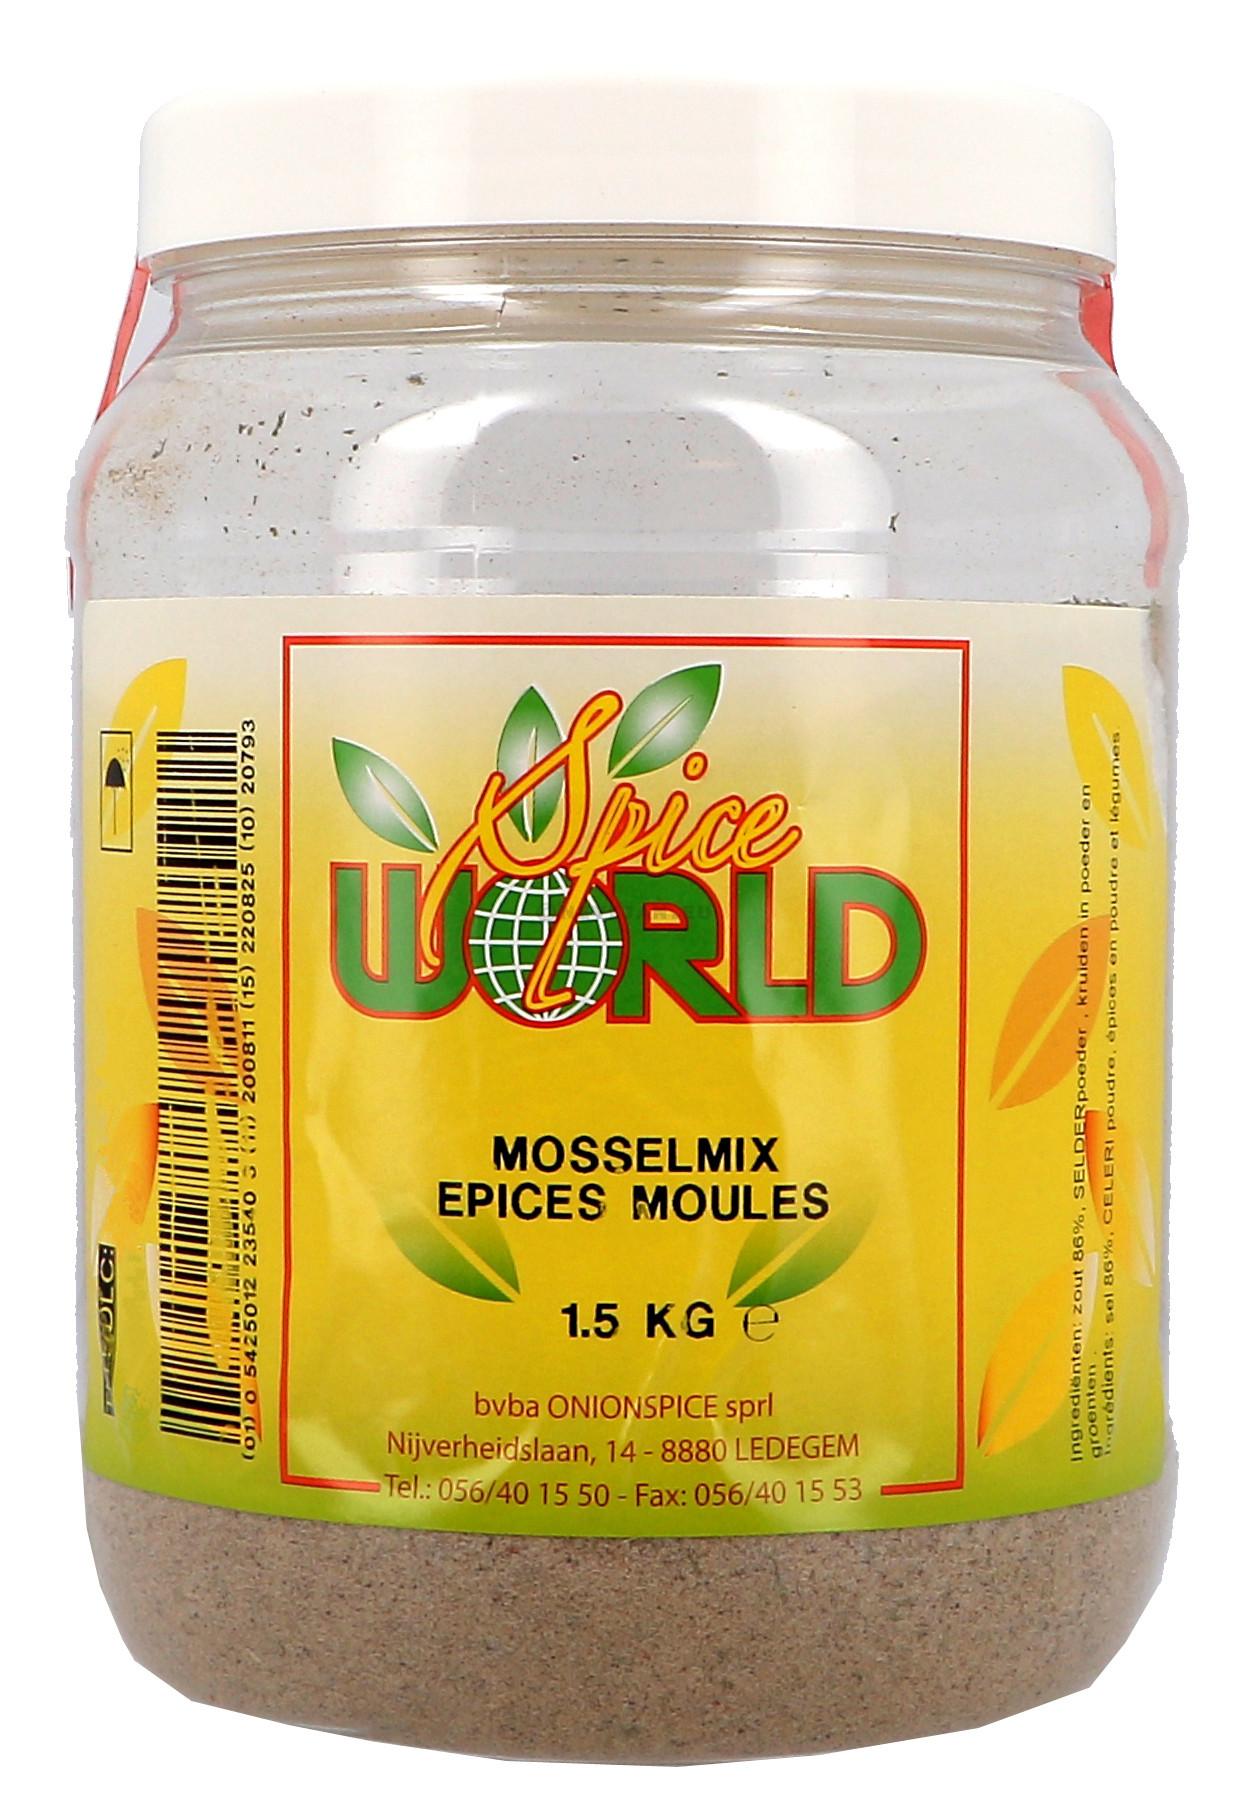 Mosselkruidmix poeder 1.5kg 1.5LP Spice World (Isfi & Verstegen)